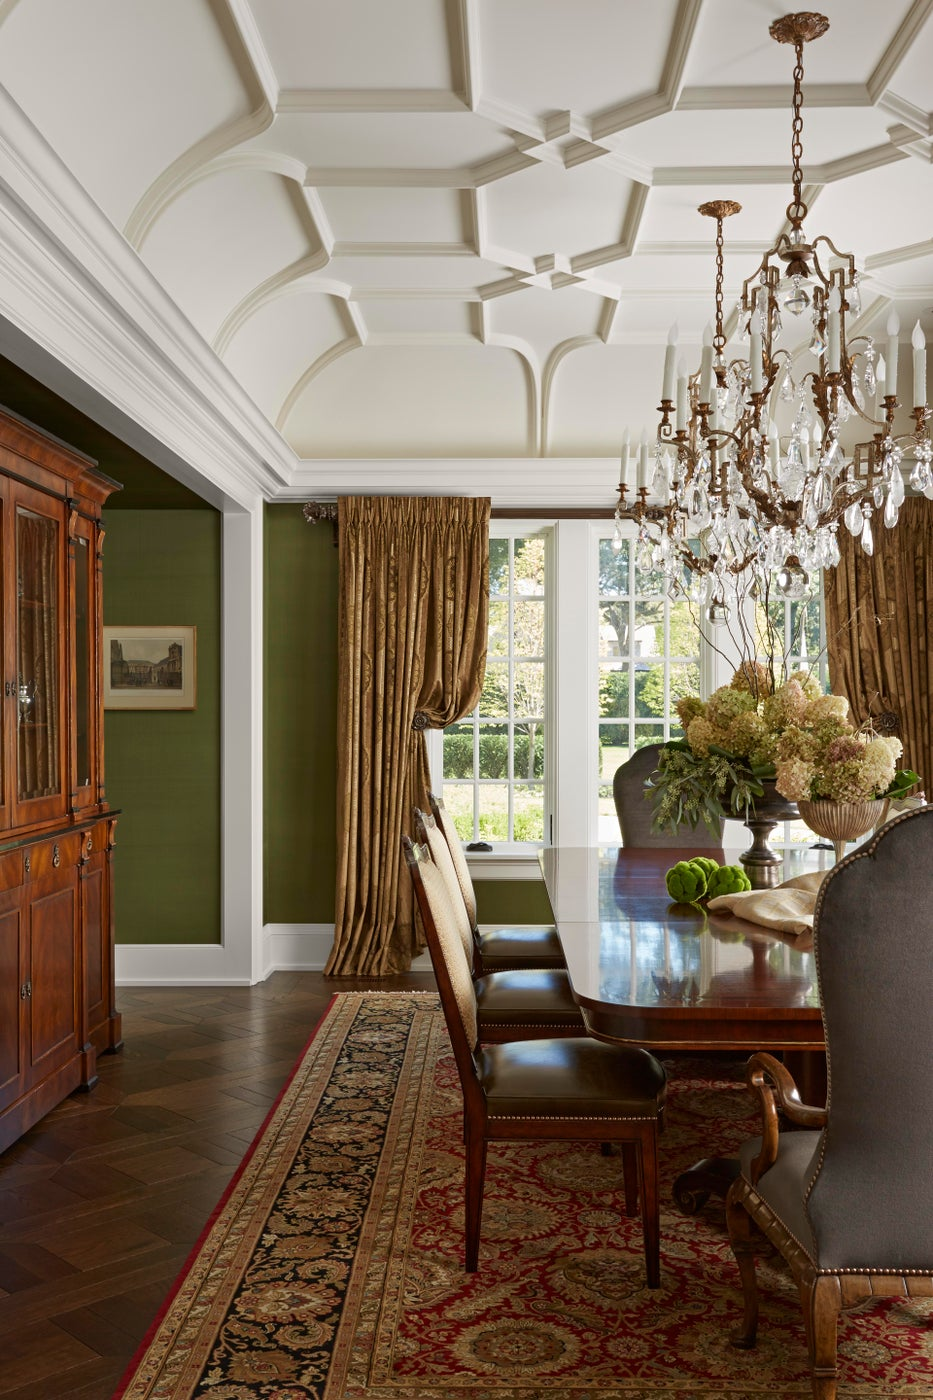 Plastered Fretwork Ceiling, Formal Dining Room